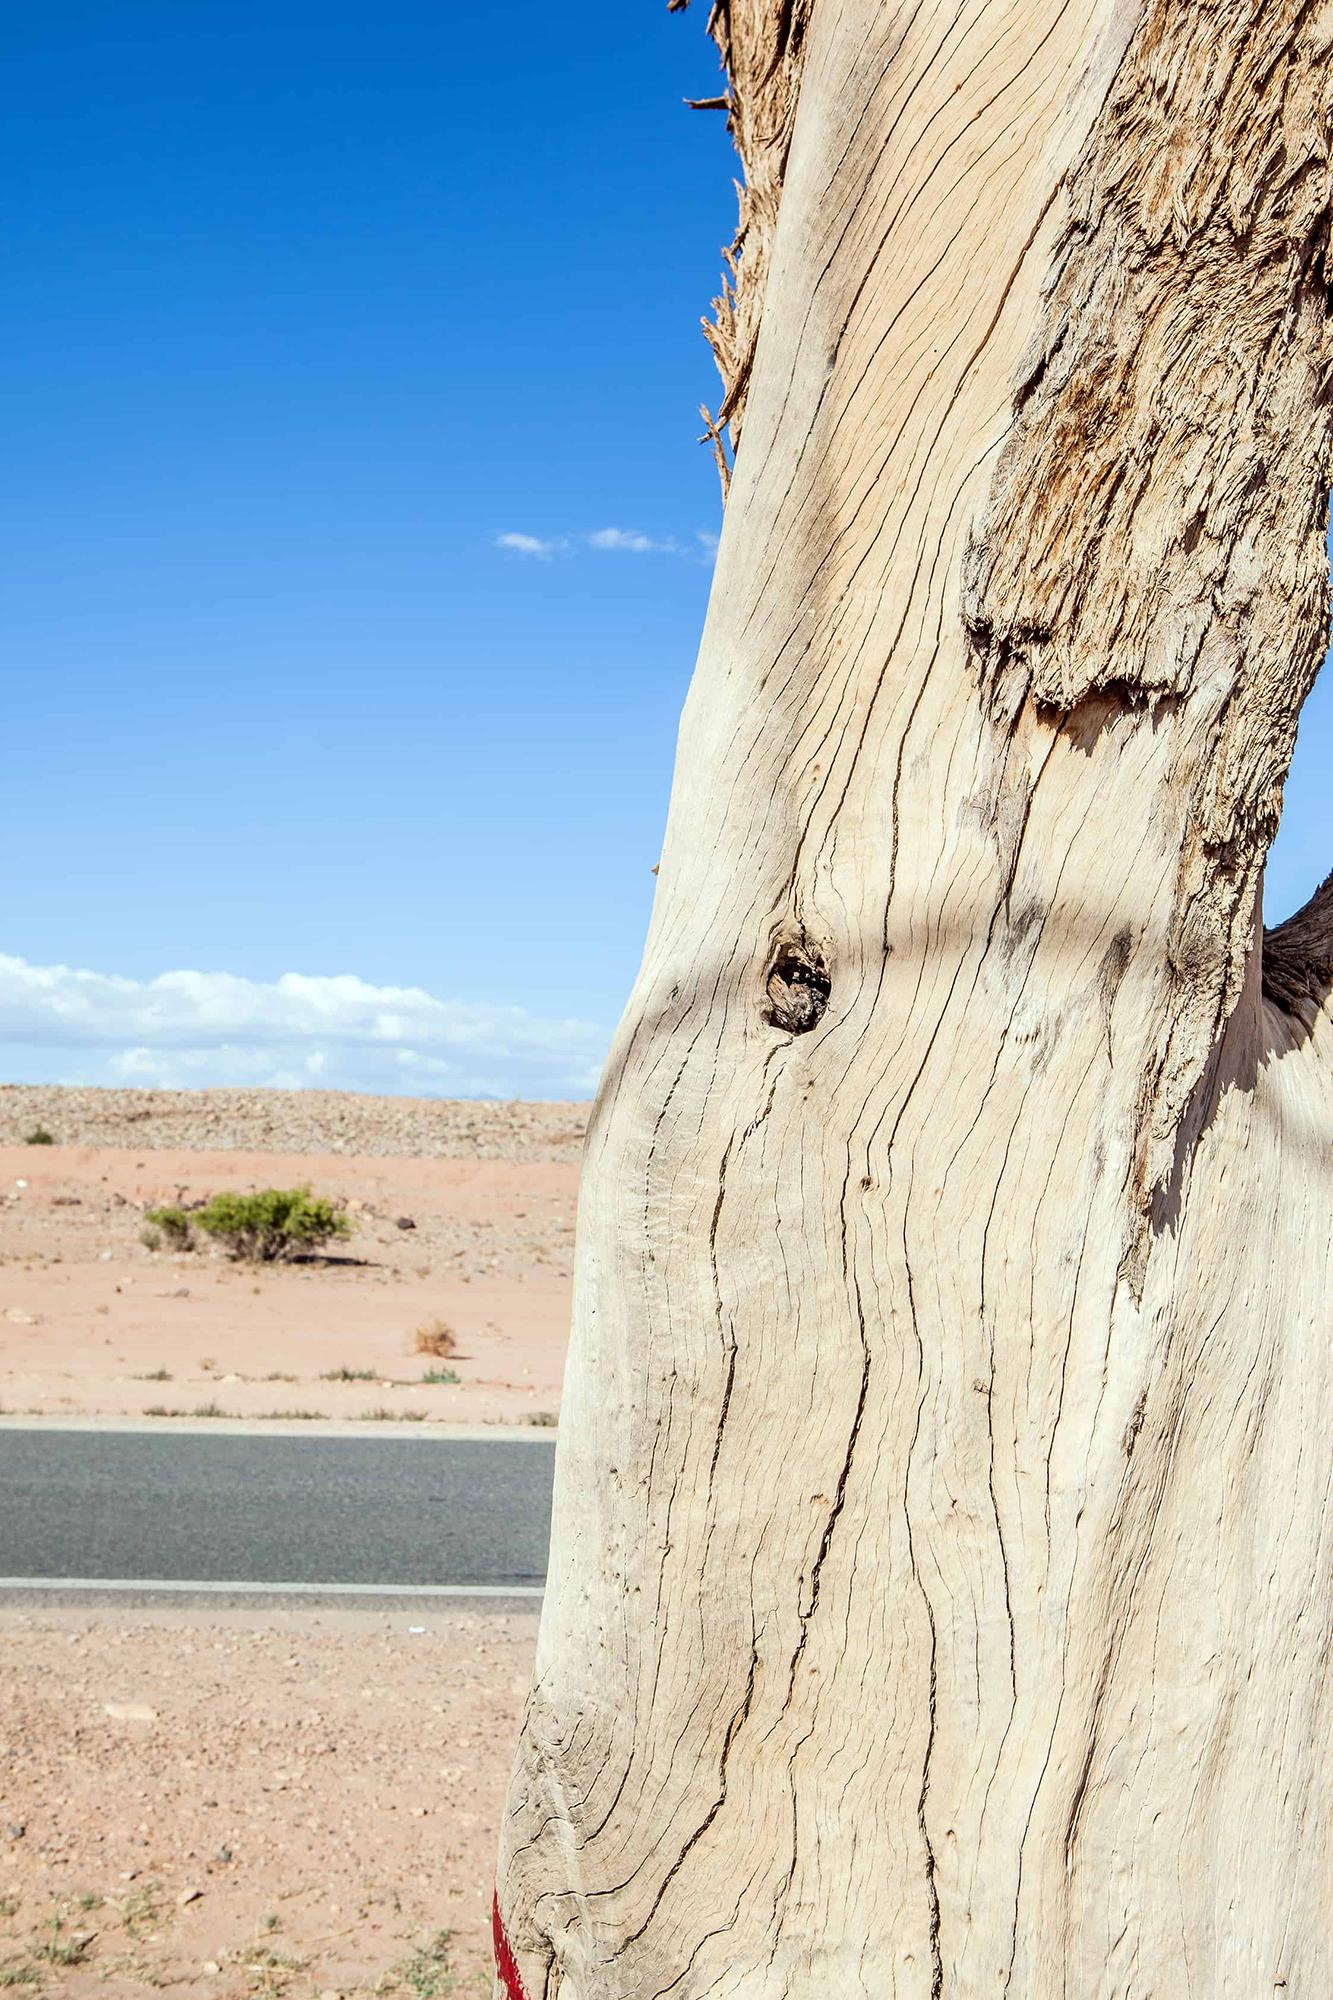 arbre mort bord de route maroc